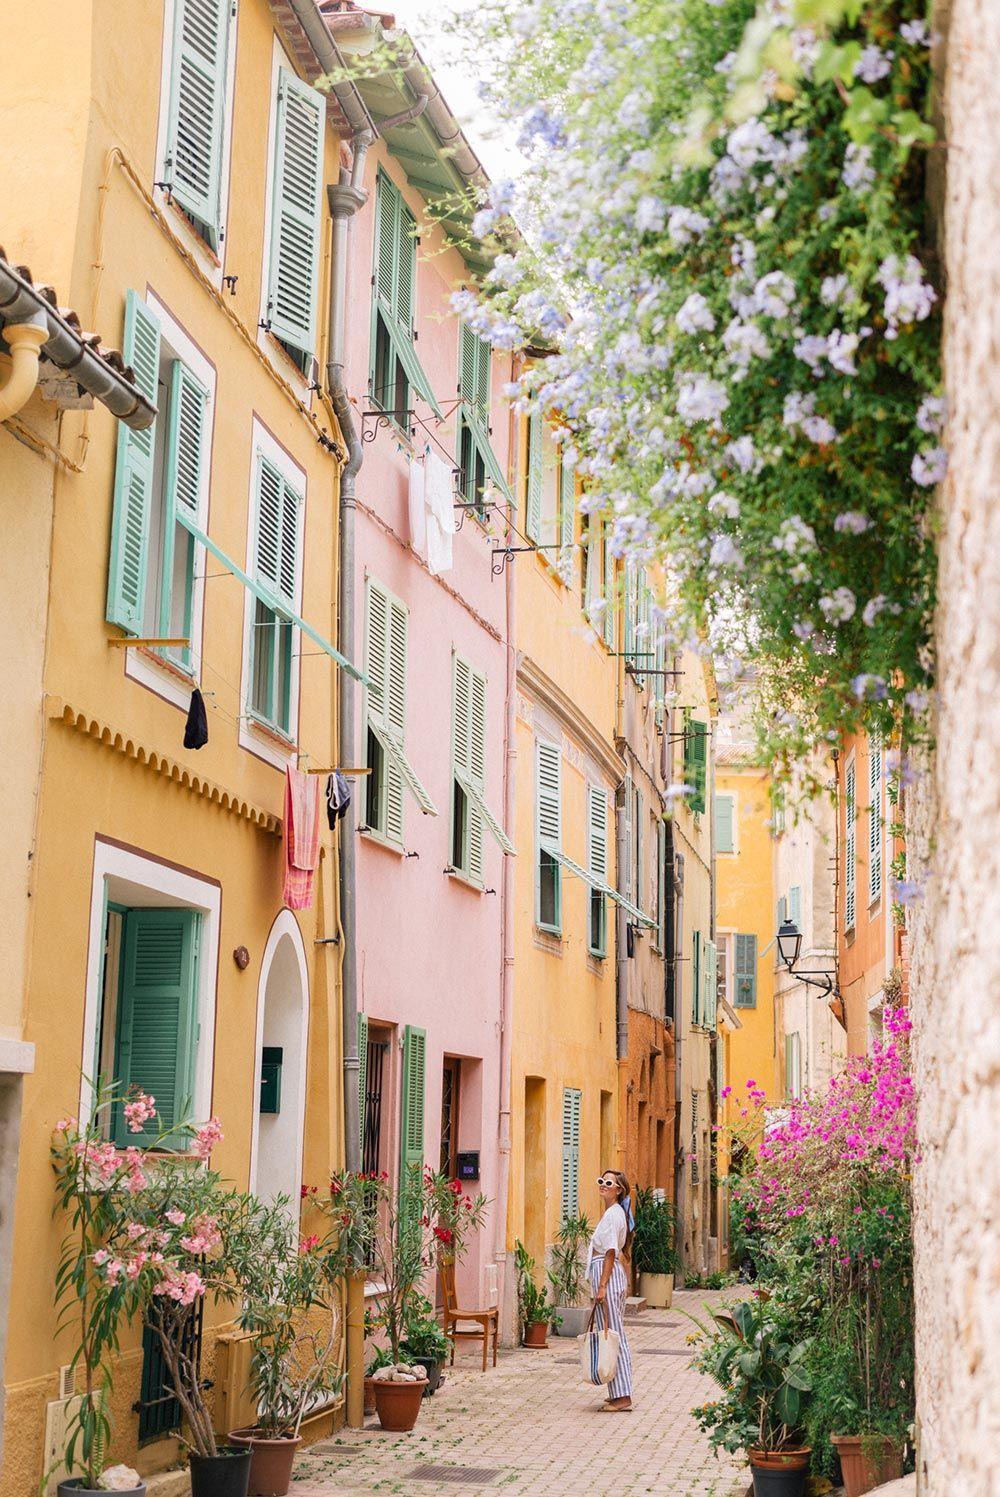 Top 2019 Honeymoon Destinations To Put On Your Radar ⋆ Ruffled